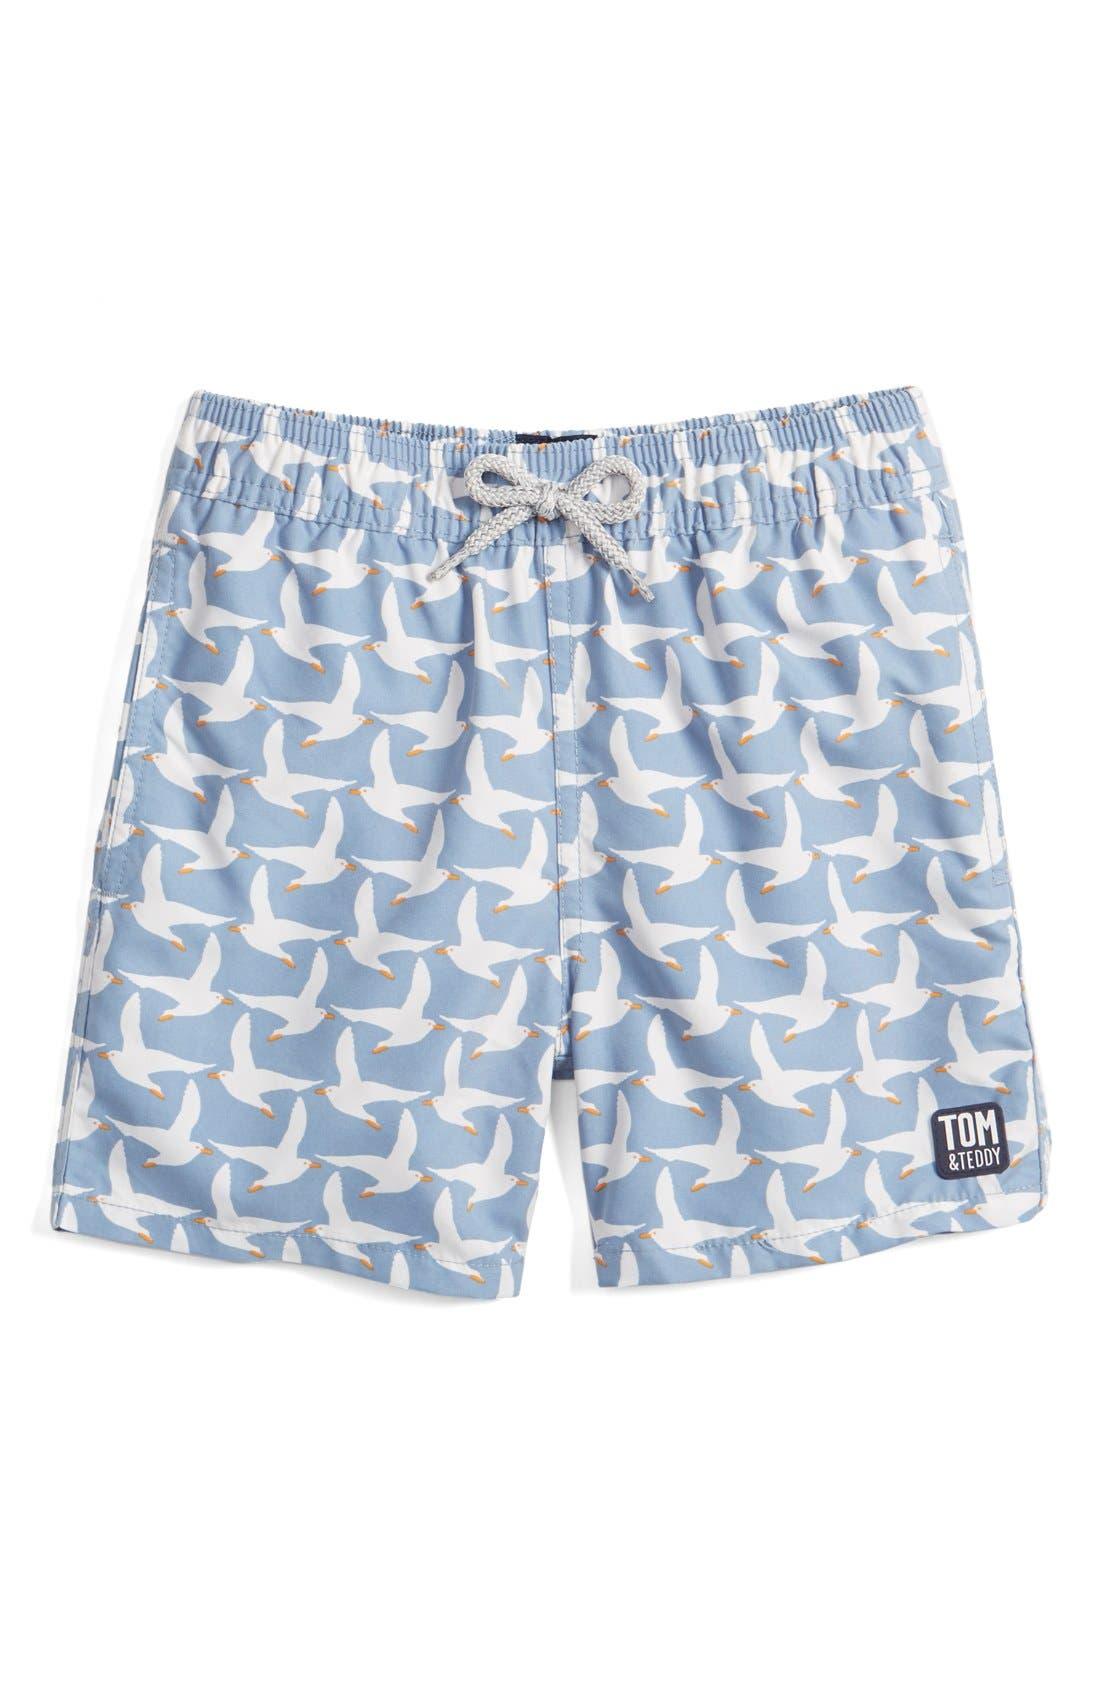 Tom & Teddy 'Pattern Seagulls' Swim Trunks (Toddler Boys, Little Boys & Big Boys)